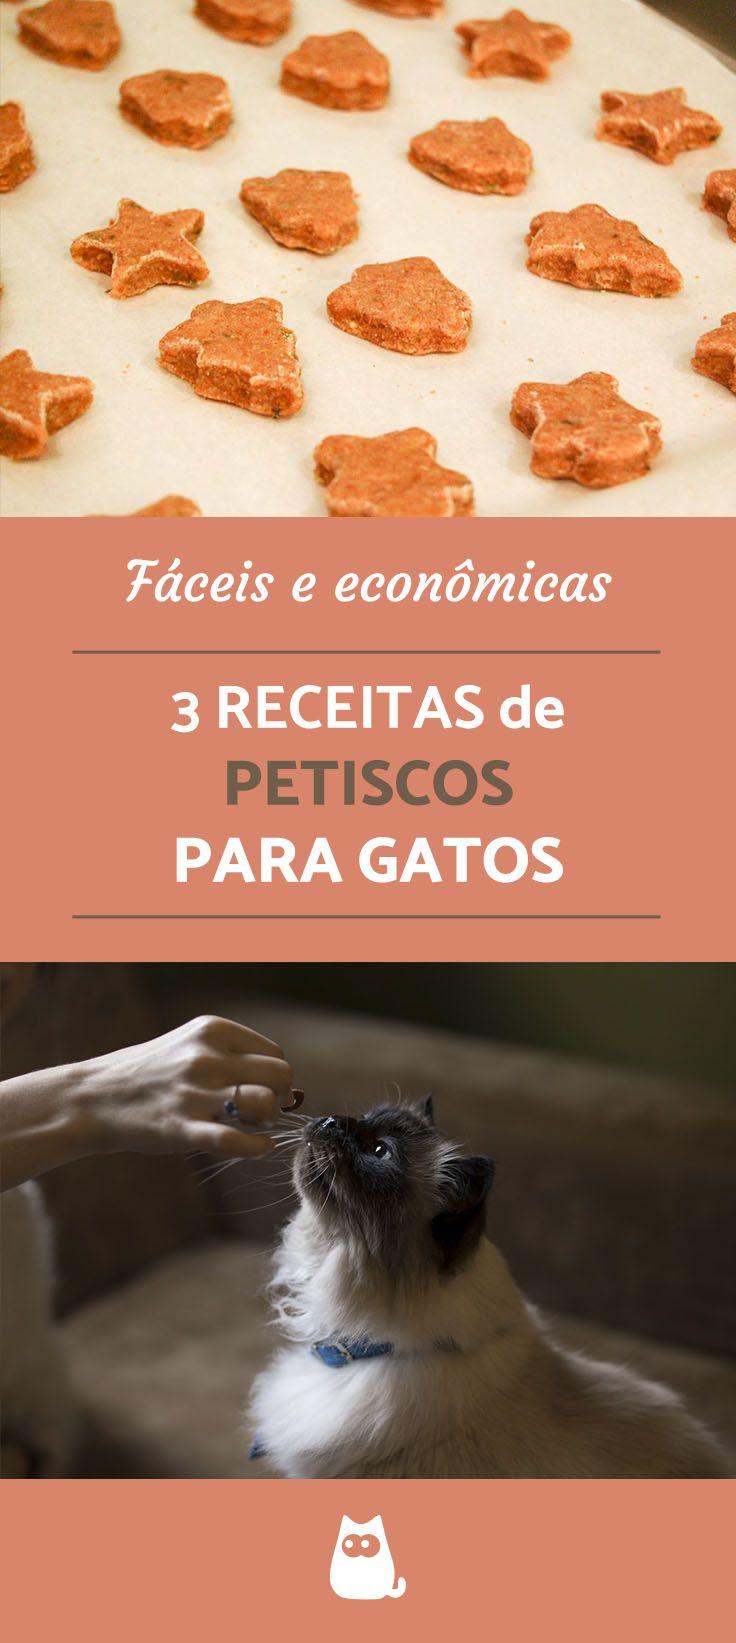 Opções caseiras, práticas, econômicas e deliciosas que o seu gato vai amar! Confira as 4 receitas de petisco para gatos do PeritoAnimal!  #gatos #petisco #animais #pets #felinos #diy #guloseimas